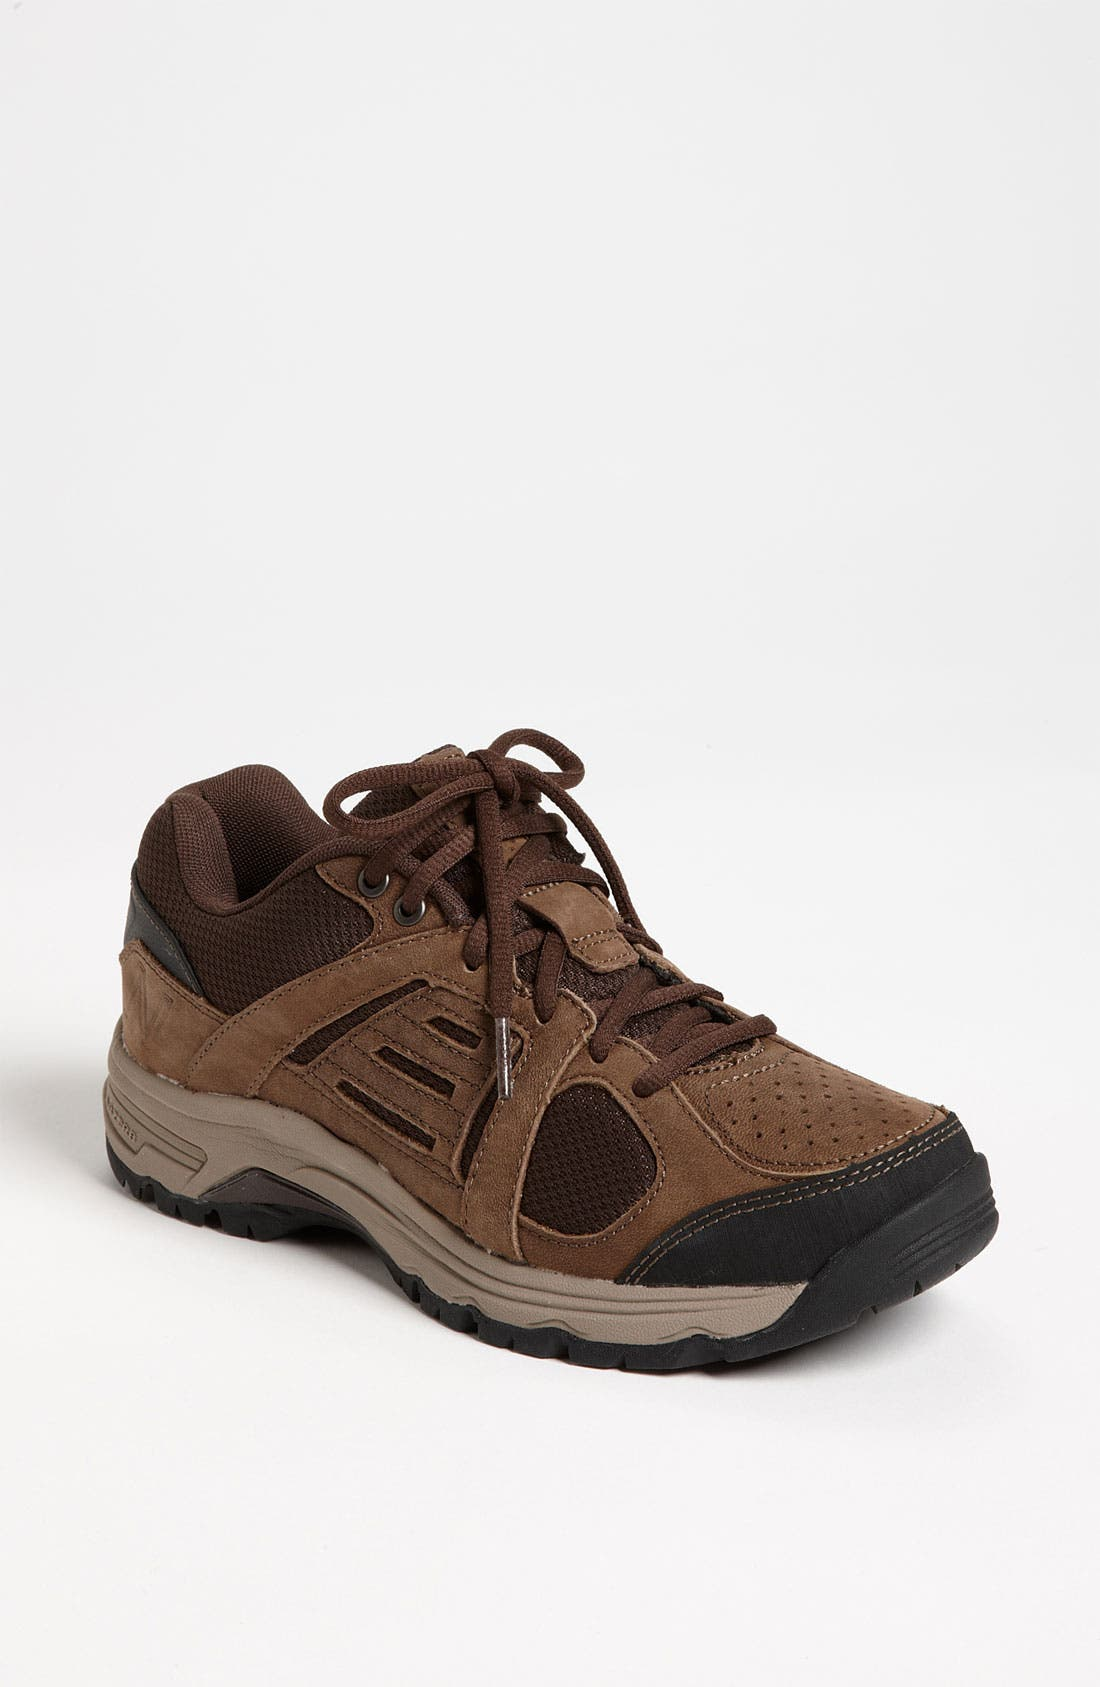 Alternate Image 1 Selected - New Balance '959' Walking Shoe (Women)